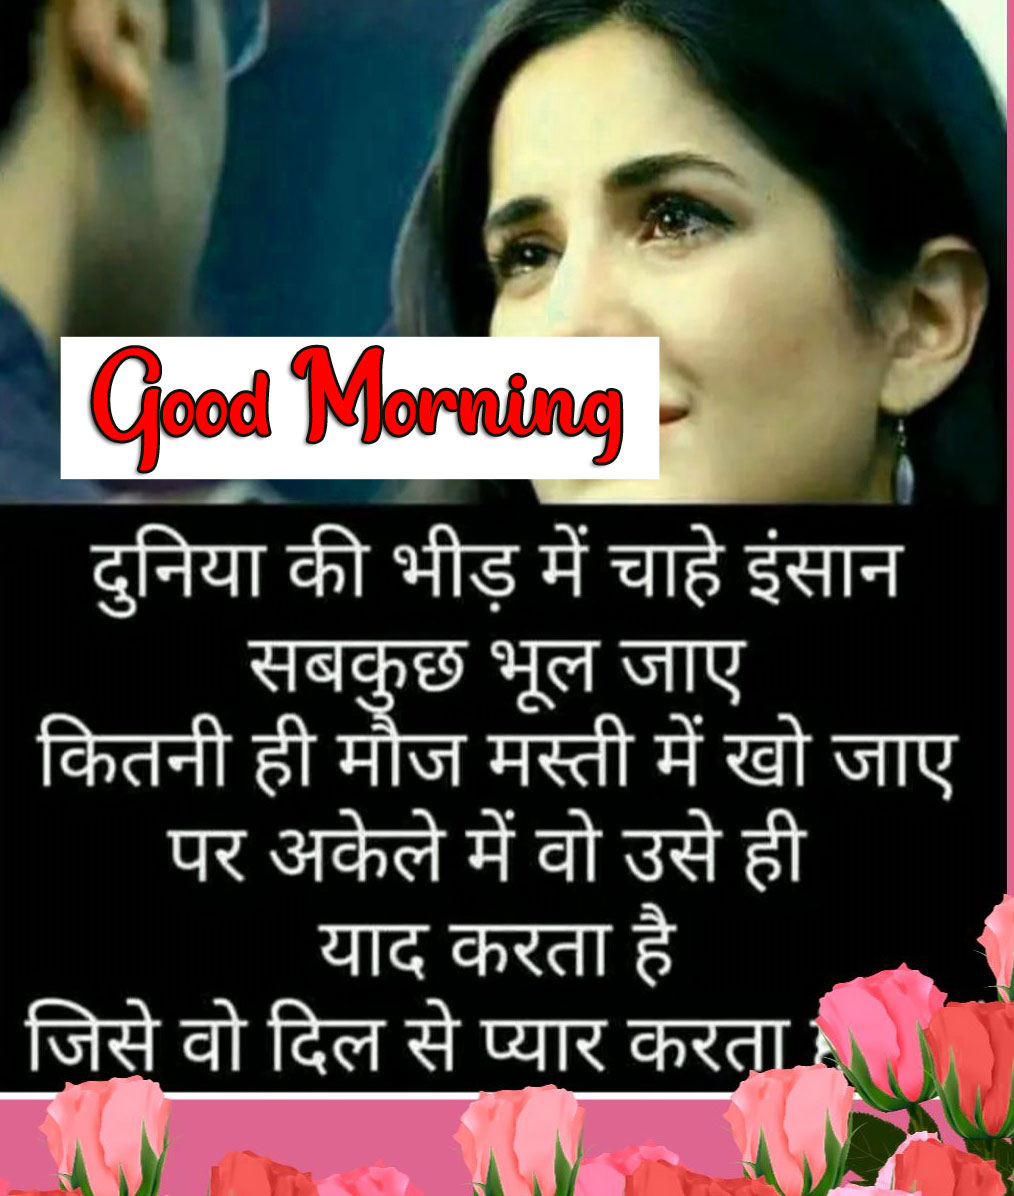 Shayari good Morning Wallpaper Pics For Facebook